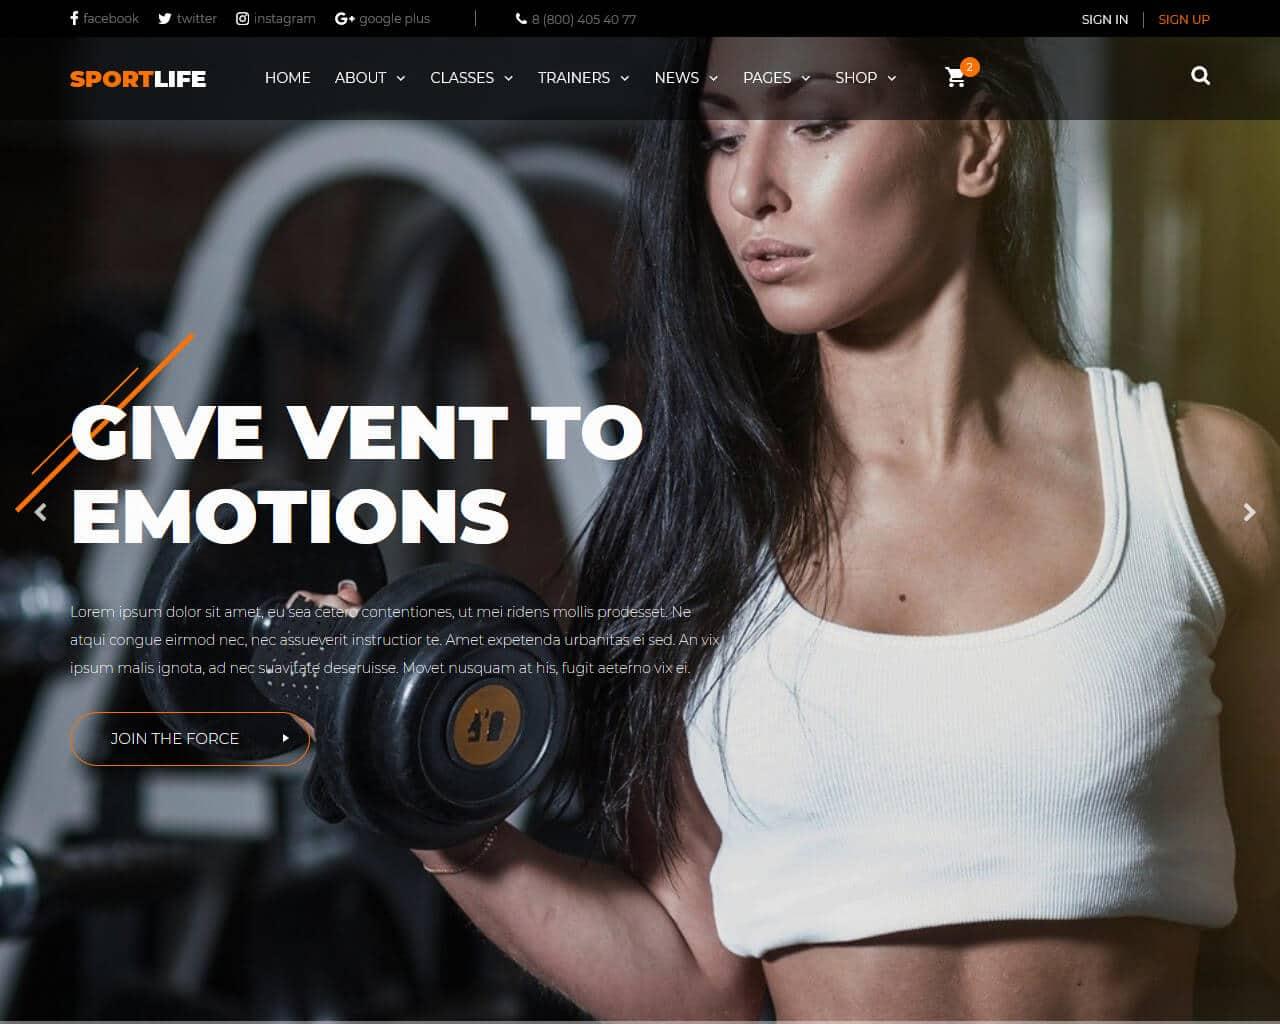 SportLife Website Template